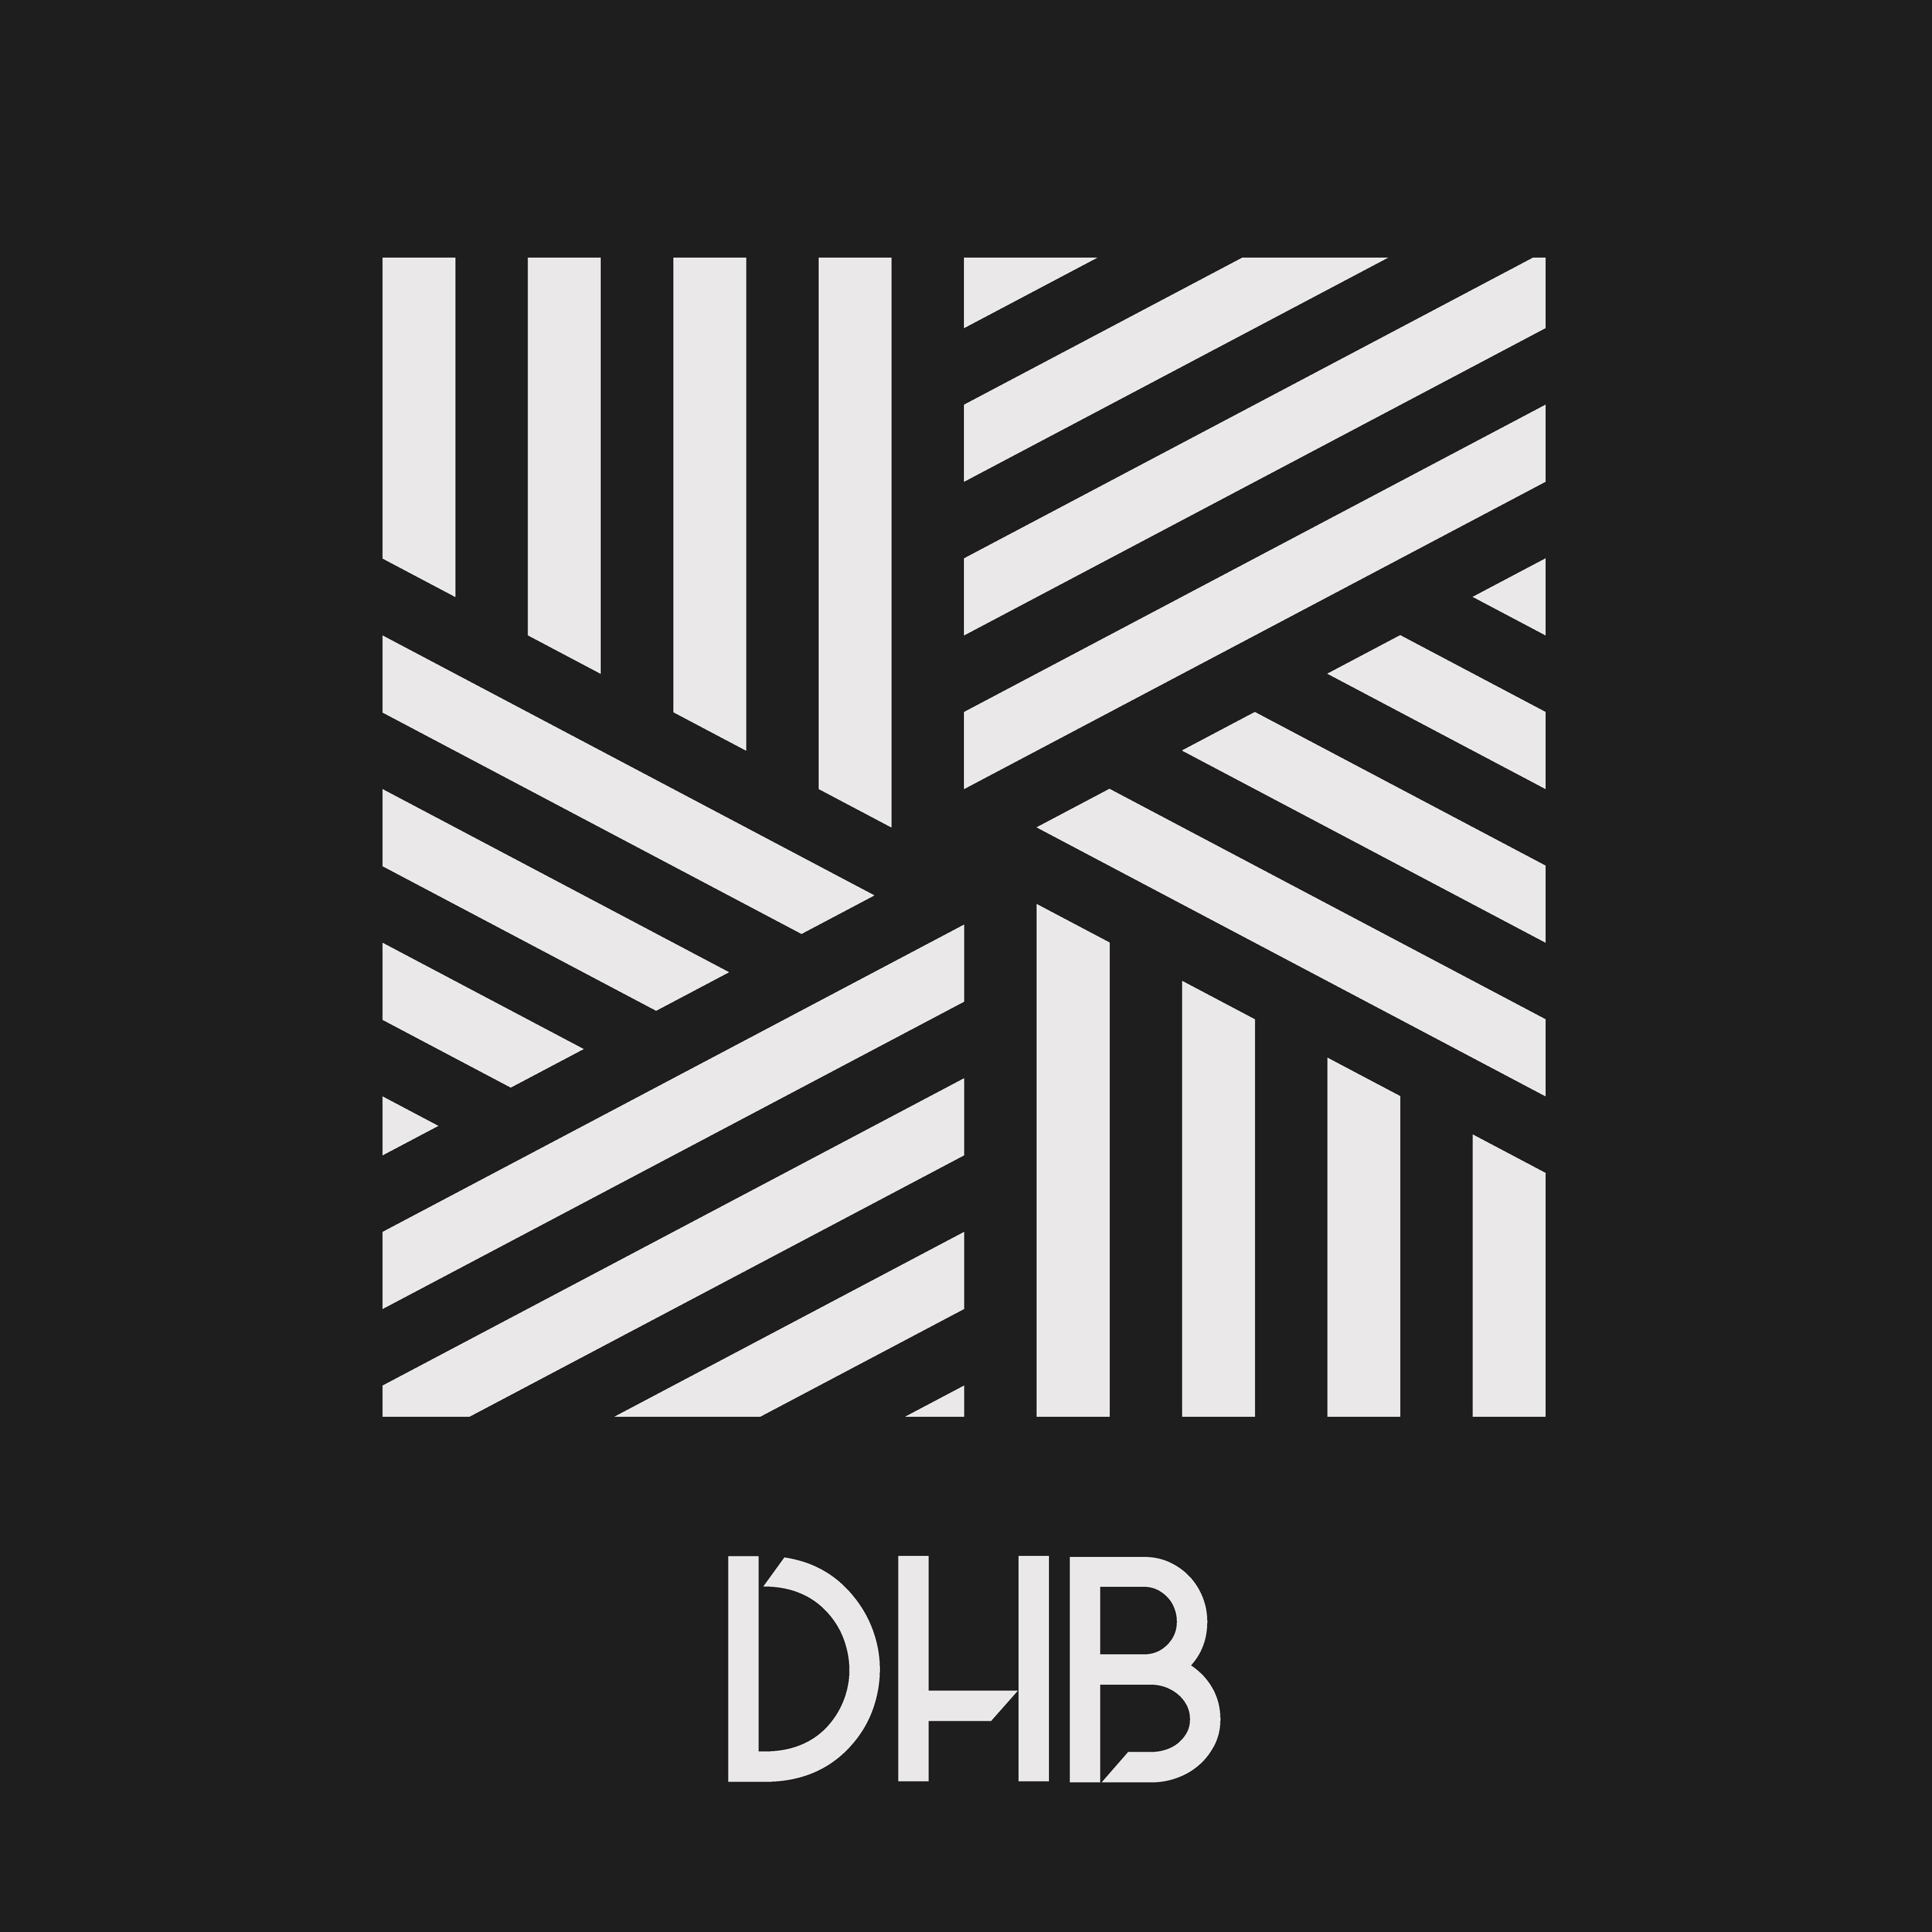 Dhb Livestream